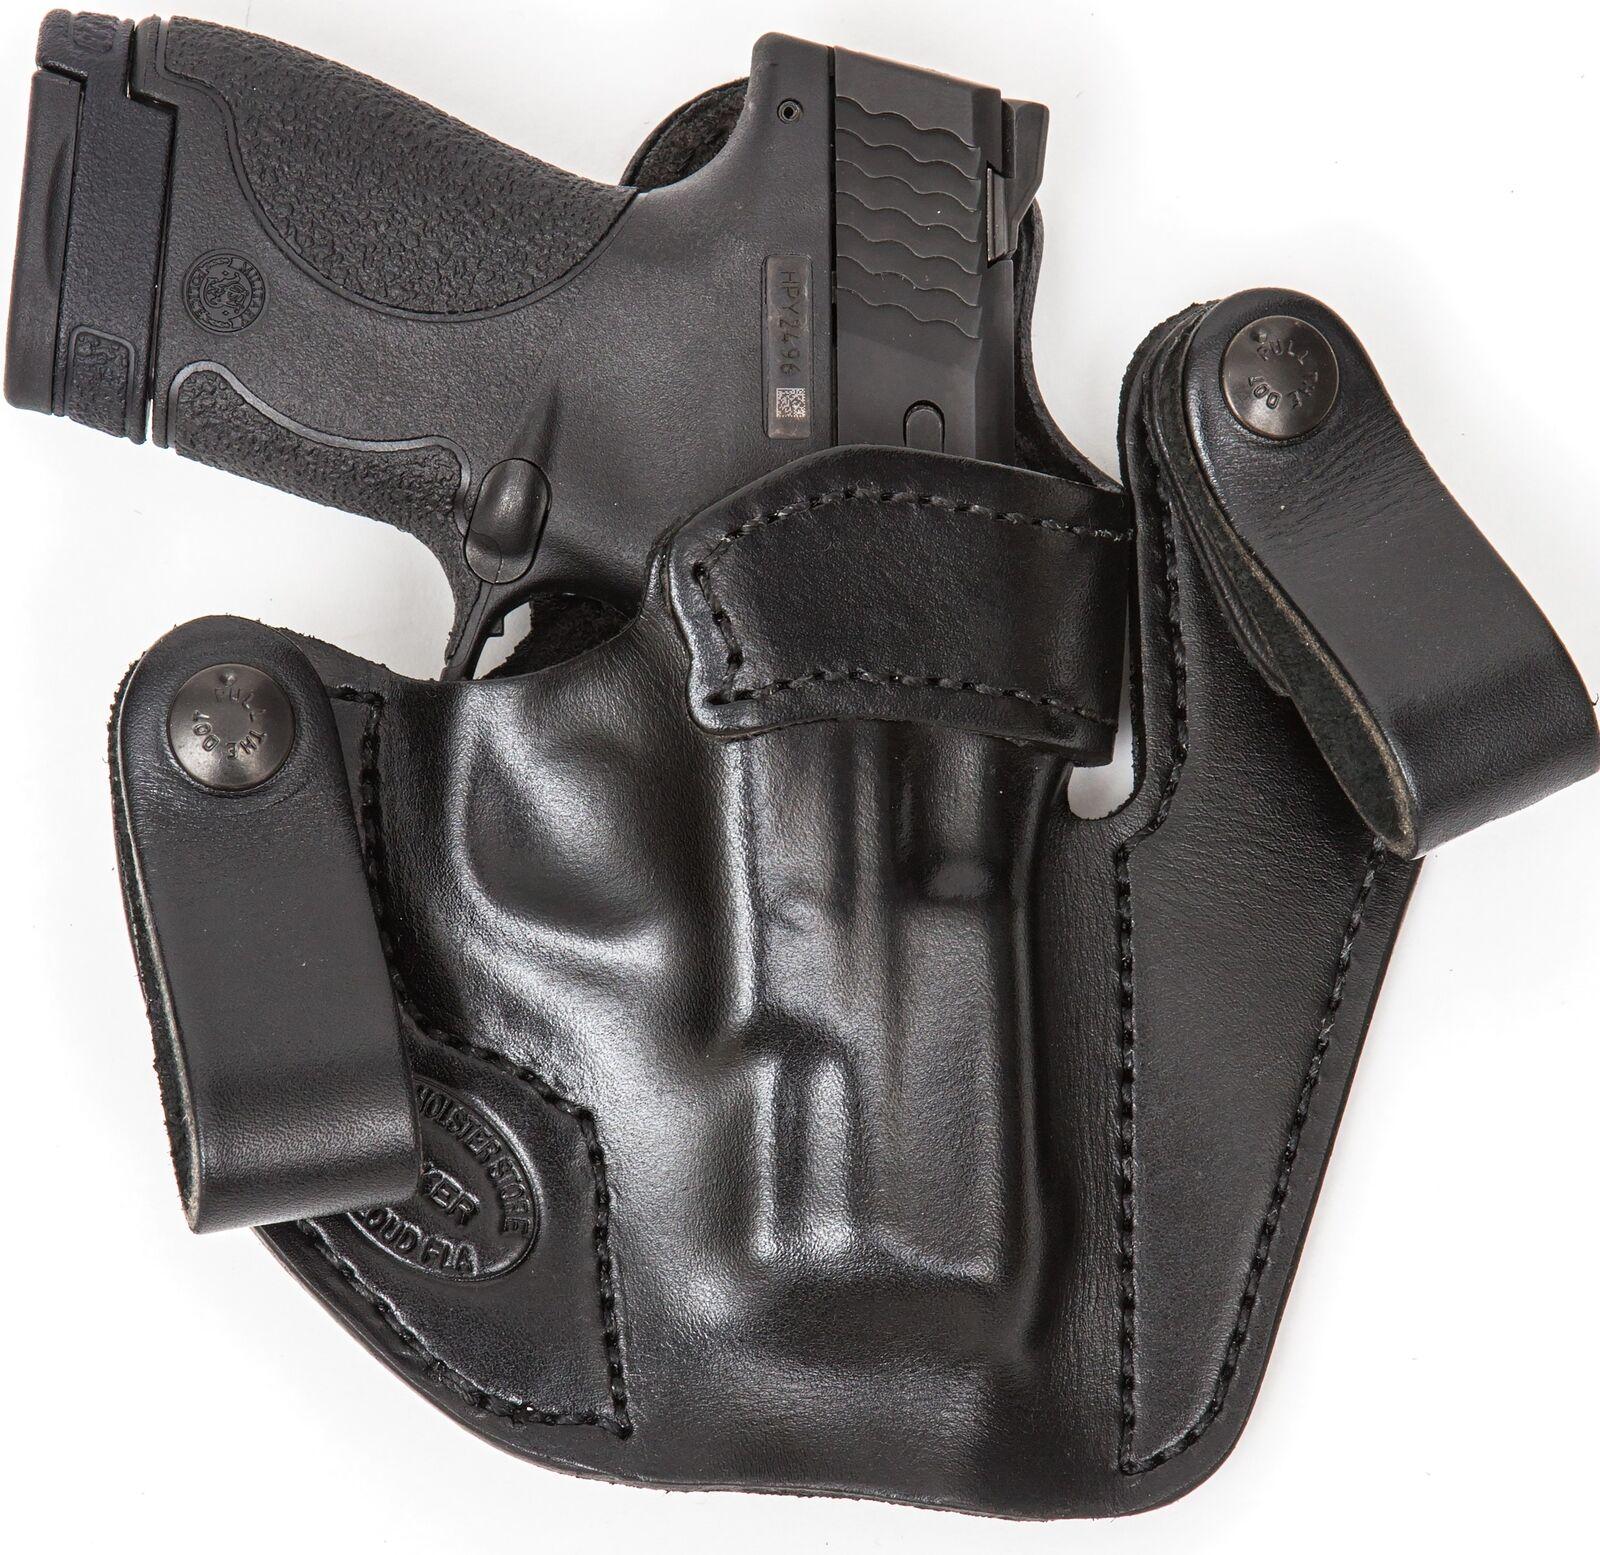 Xtreme llevar RH LH IWB Cuero Funda Pistola para FNX 45 Tactical